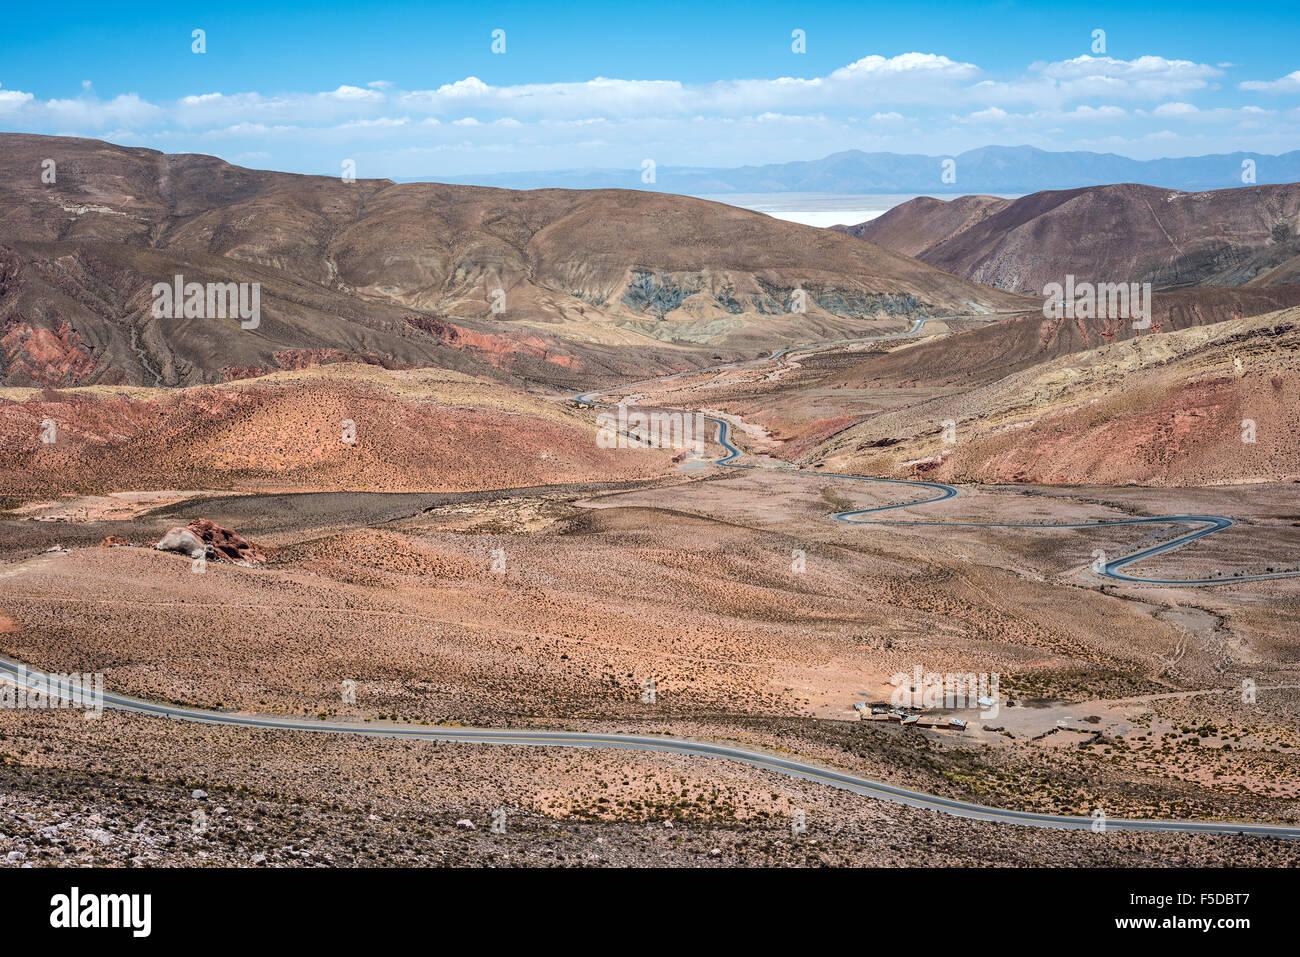 Northwest Argentina - Salinas Grandes Desert Landscape - Stock Image